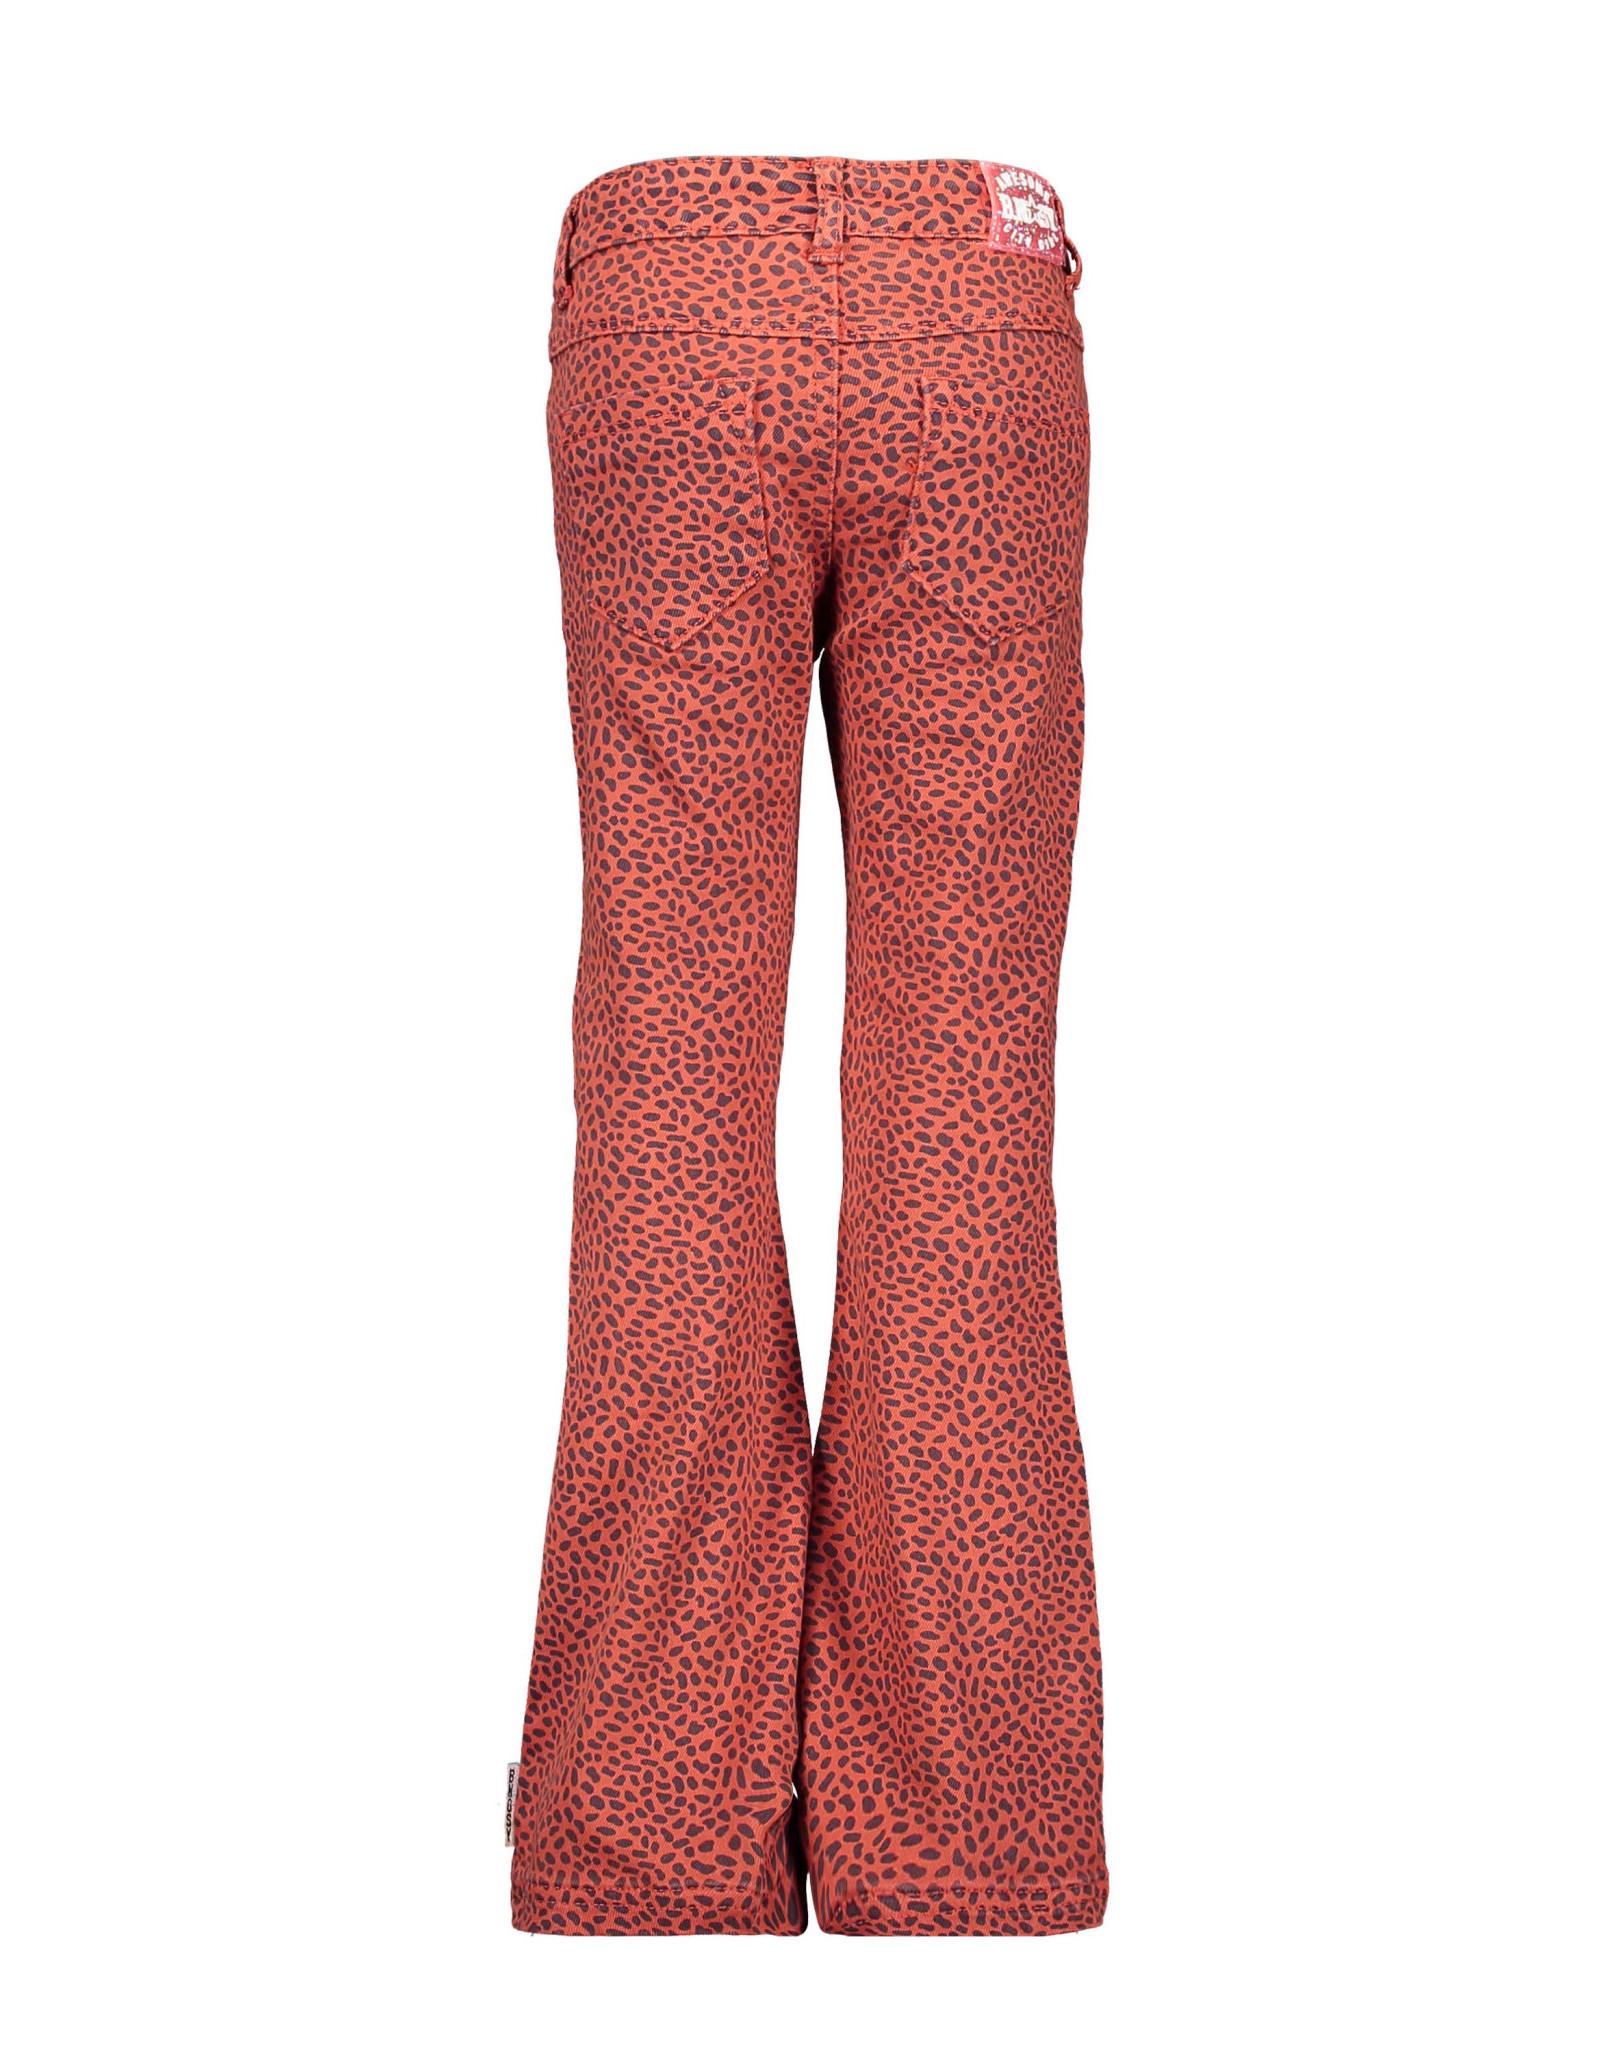 B.Nosy B.Nosy meisjes flared broek Mix Dots